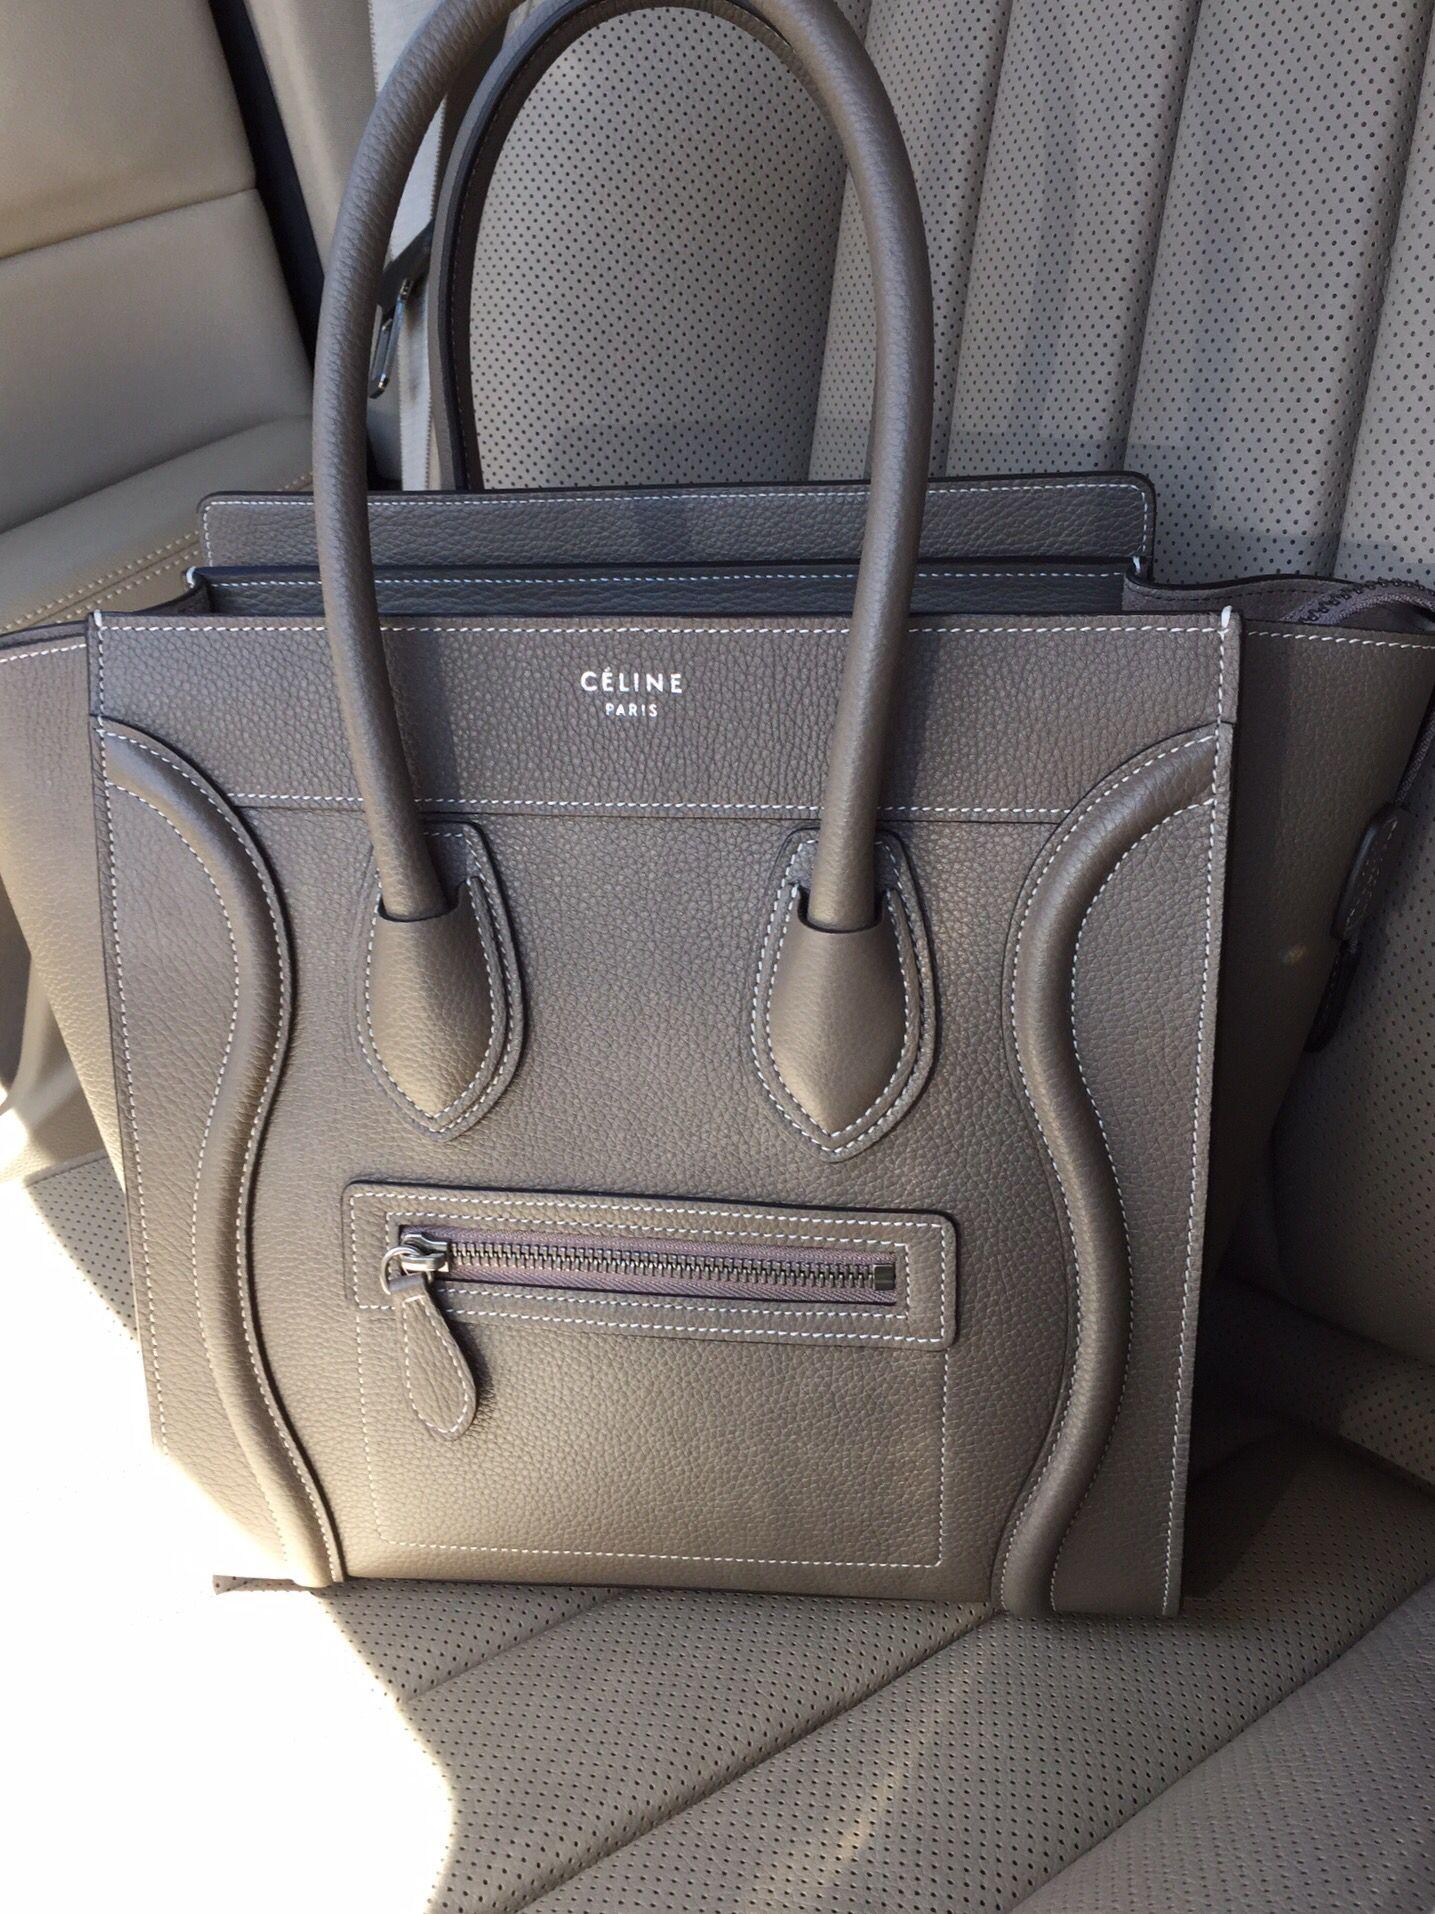 Stylish Celine (bags) - always romantic and original